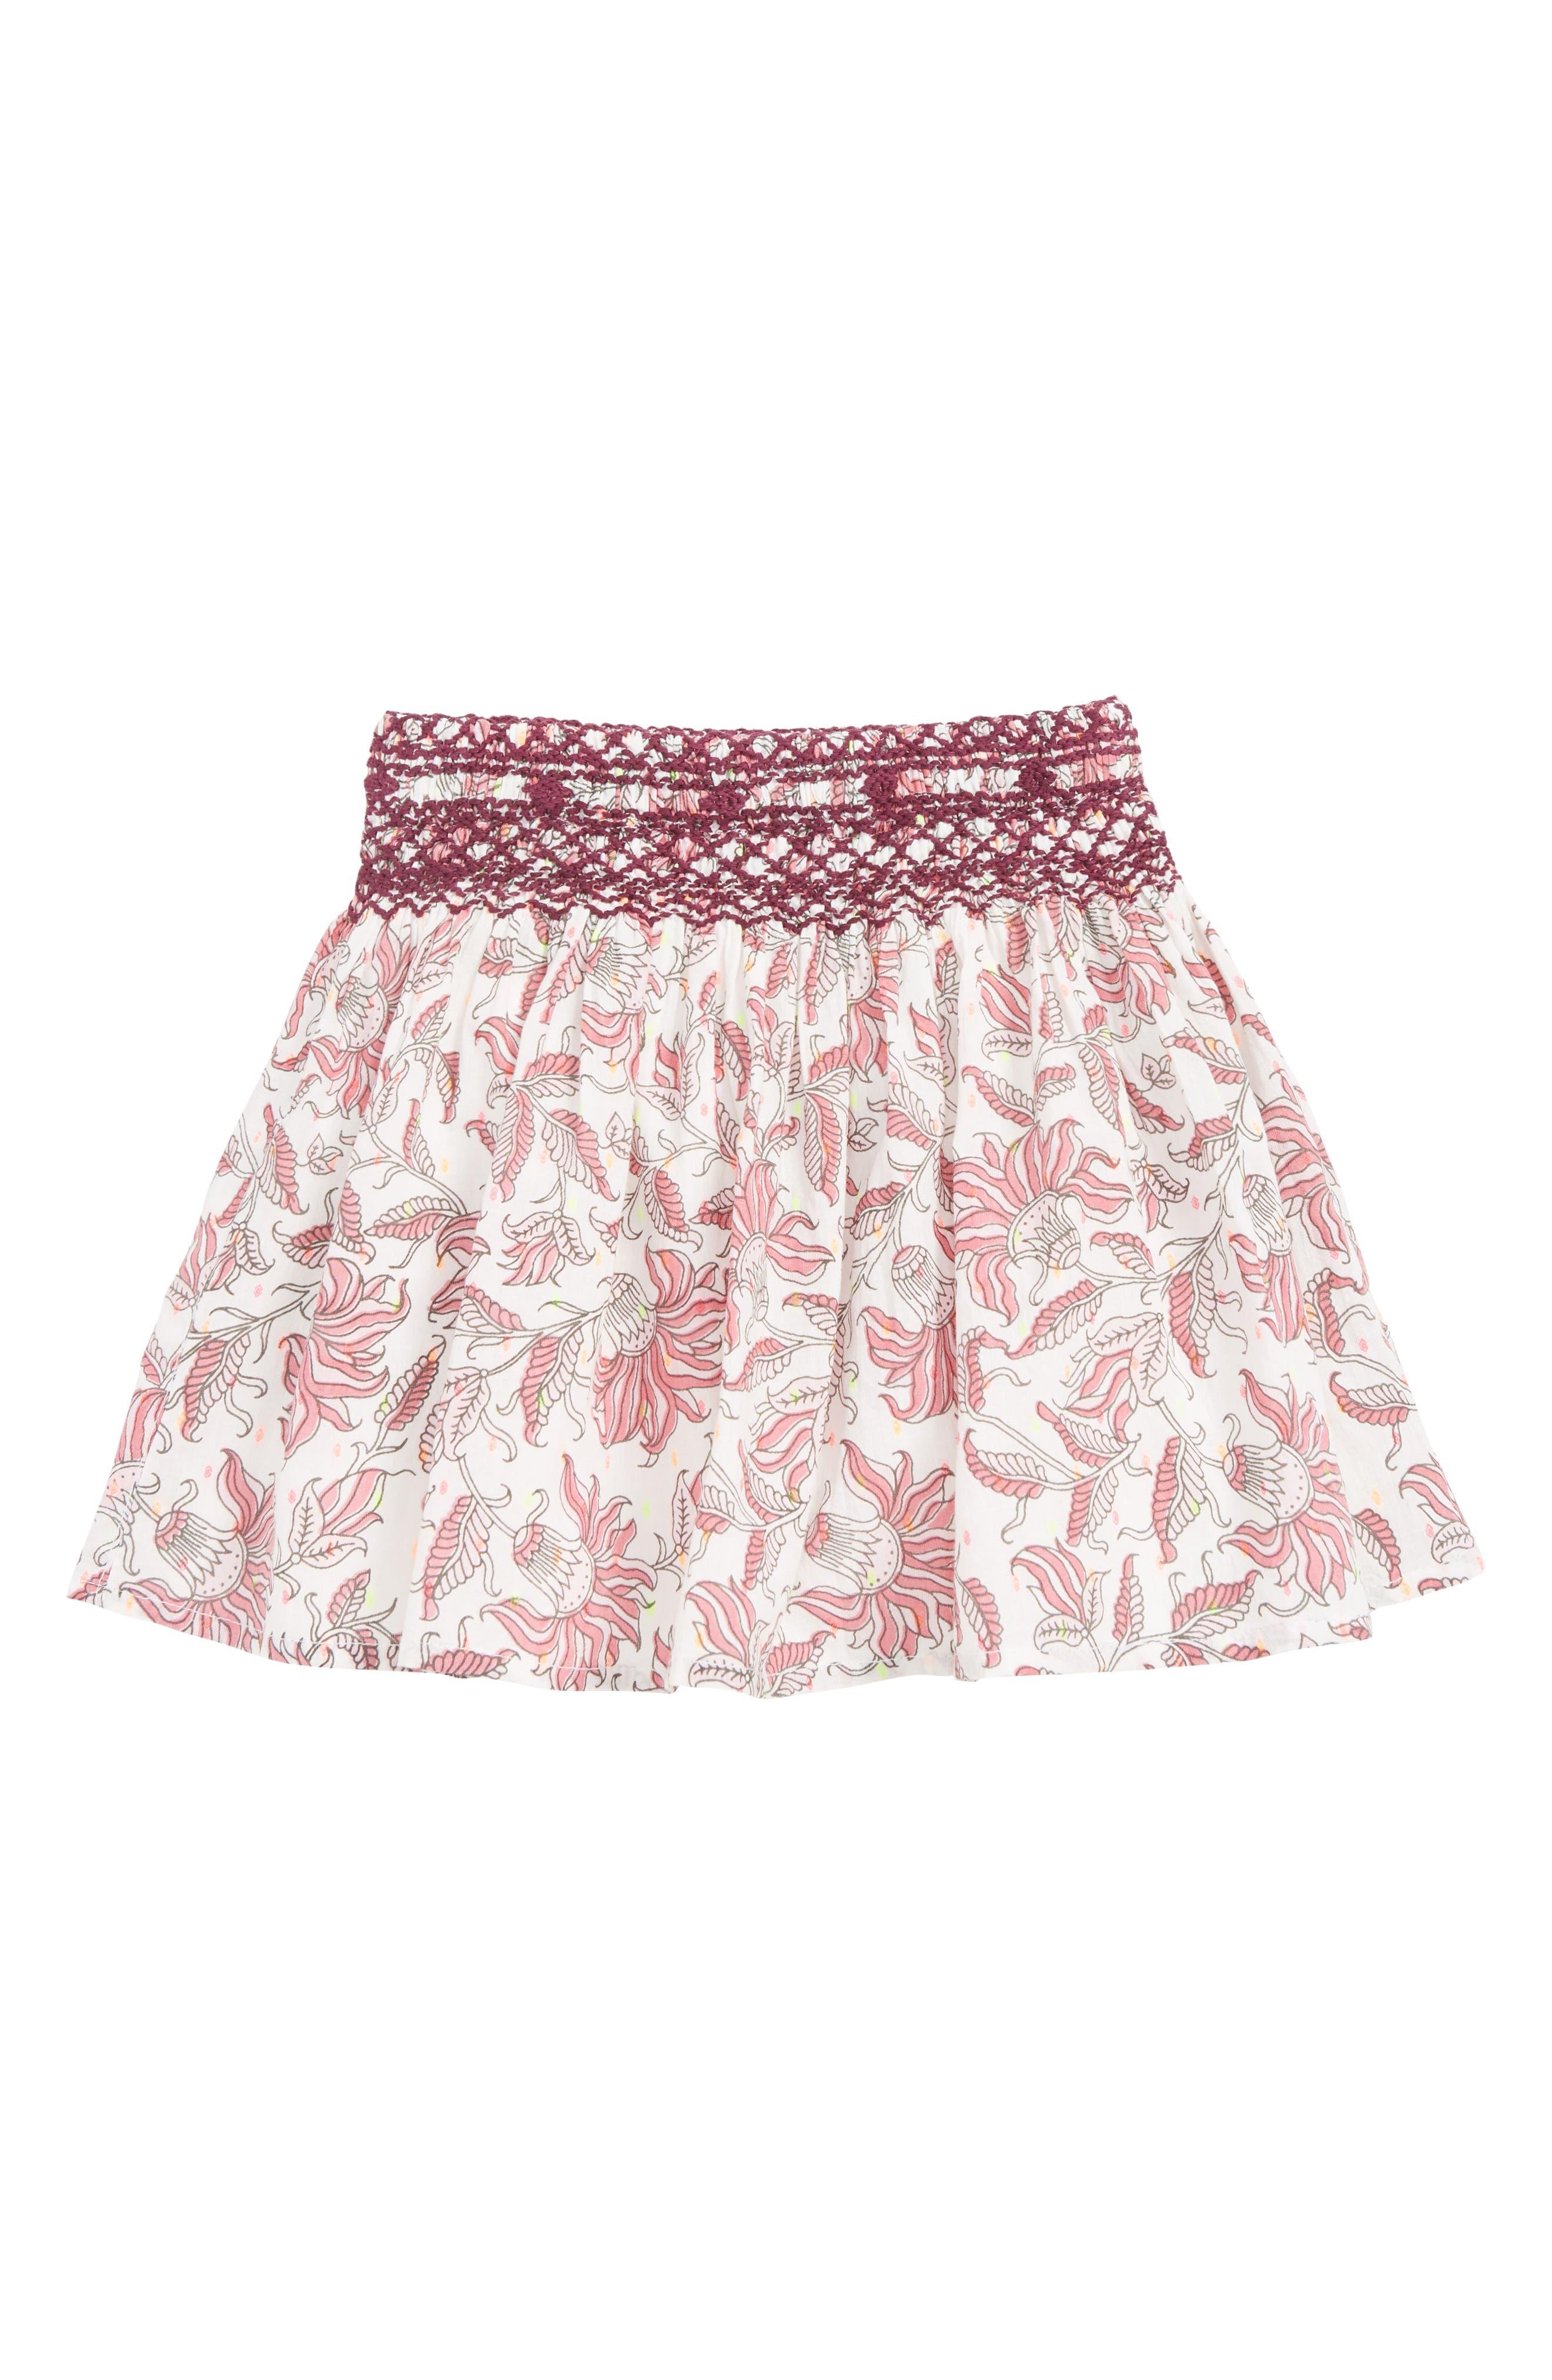 PEEK AREN'T YOU CURIOUS Peek Floral Pixie Skirt, Main, color, PINK